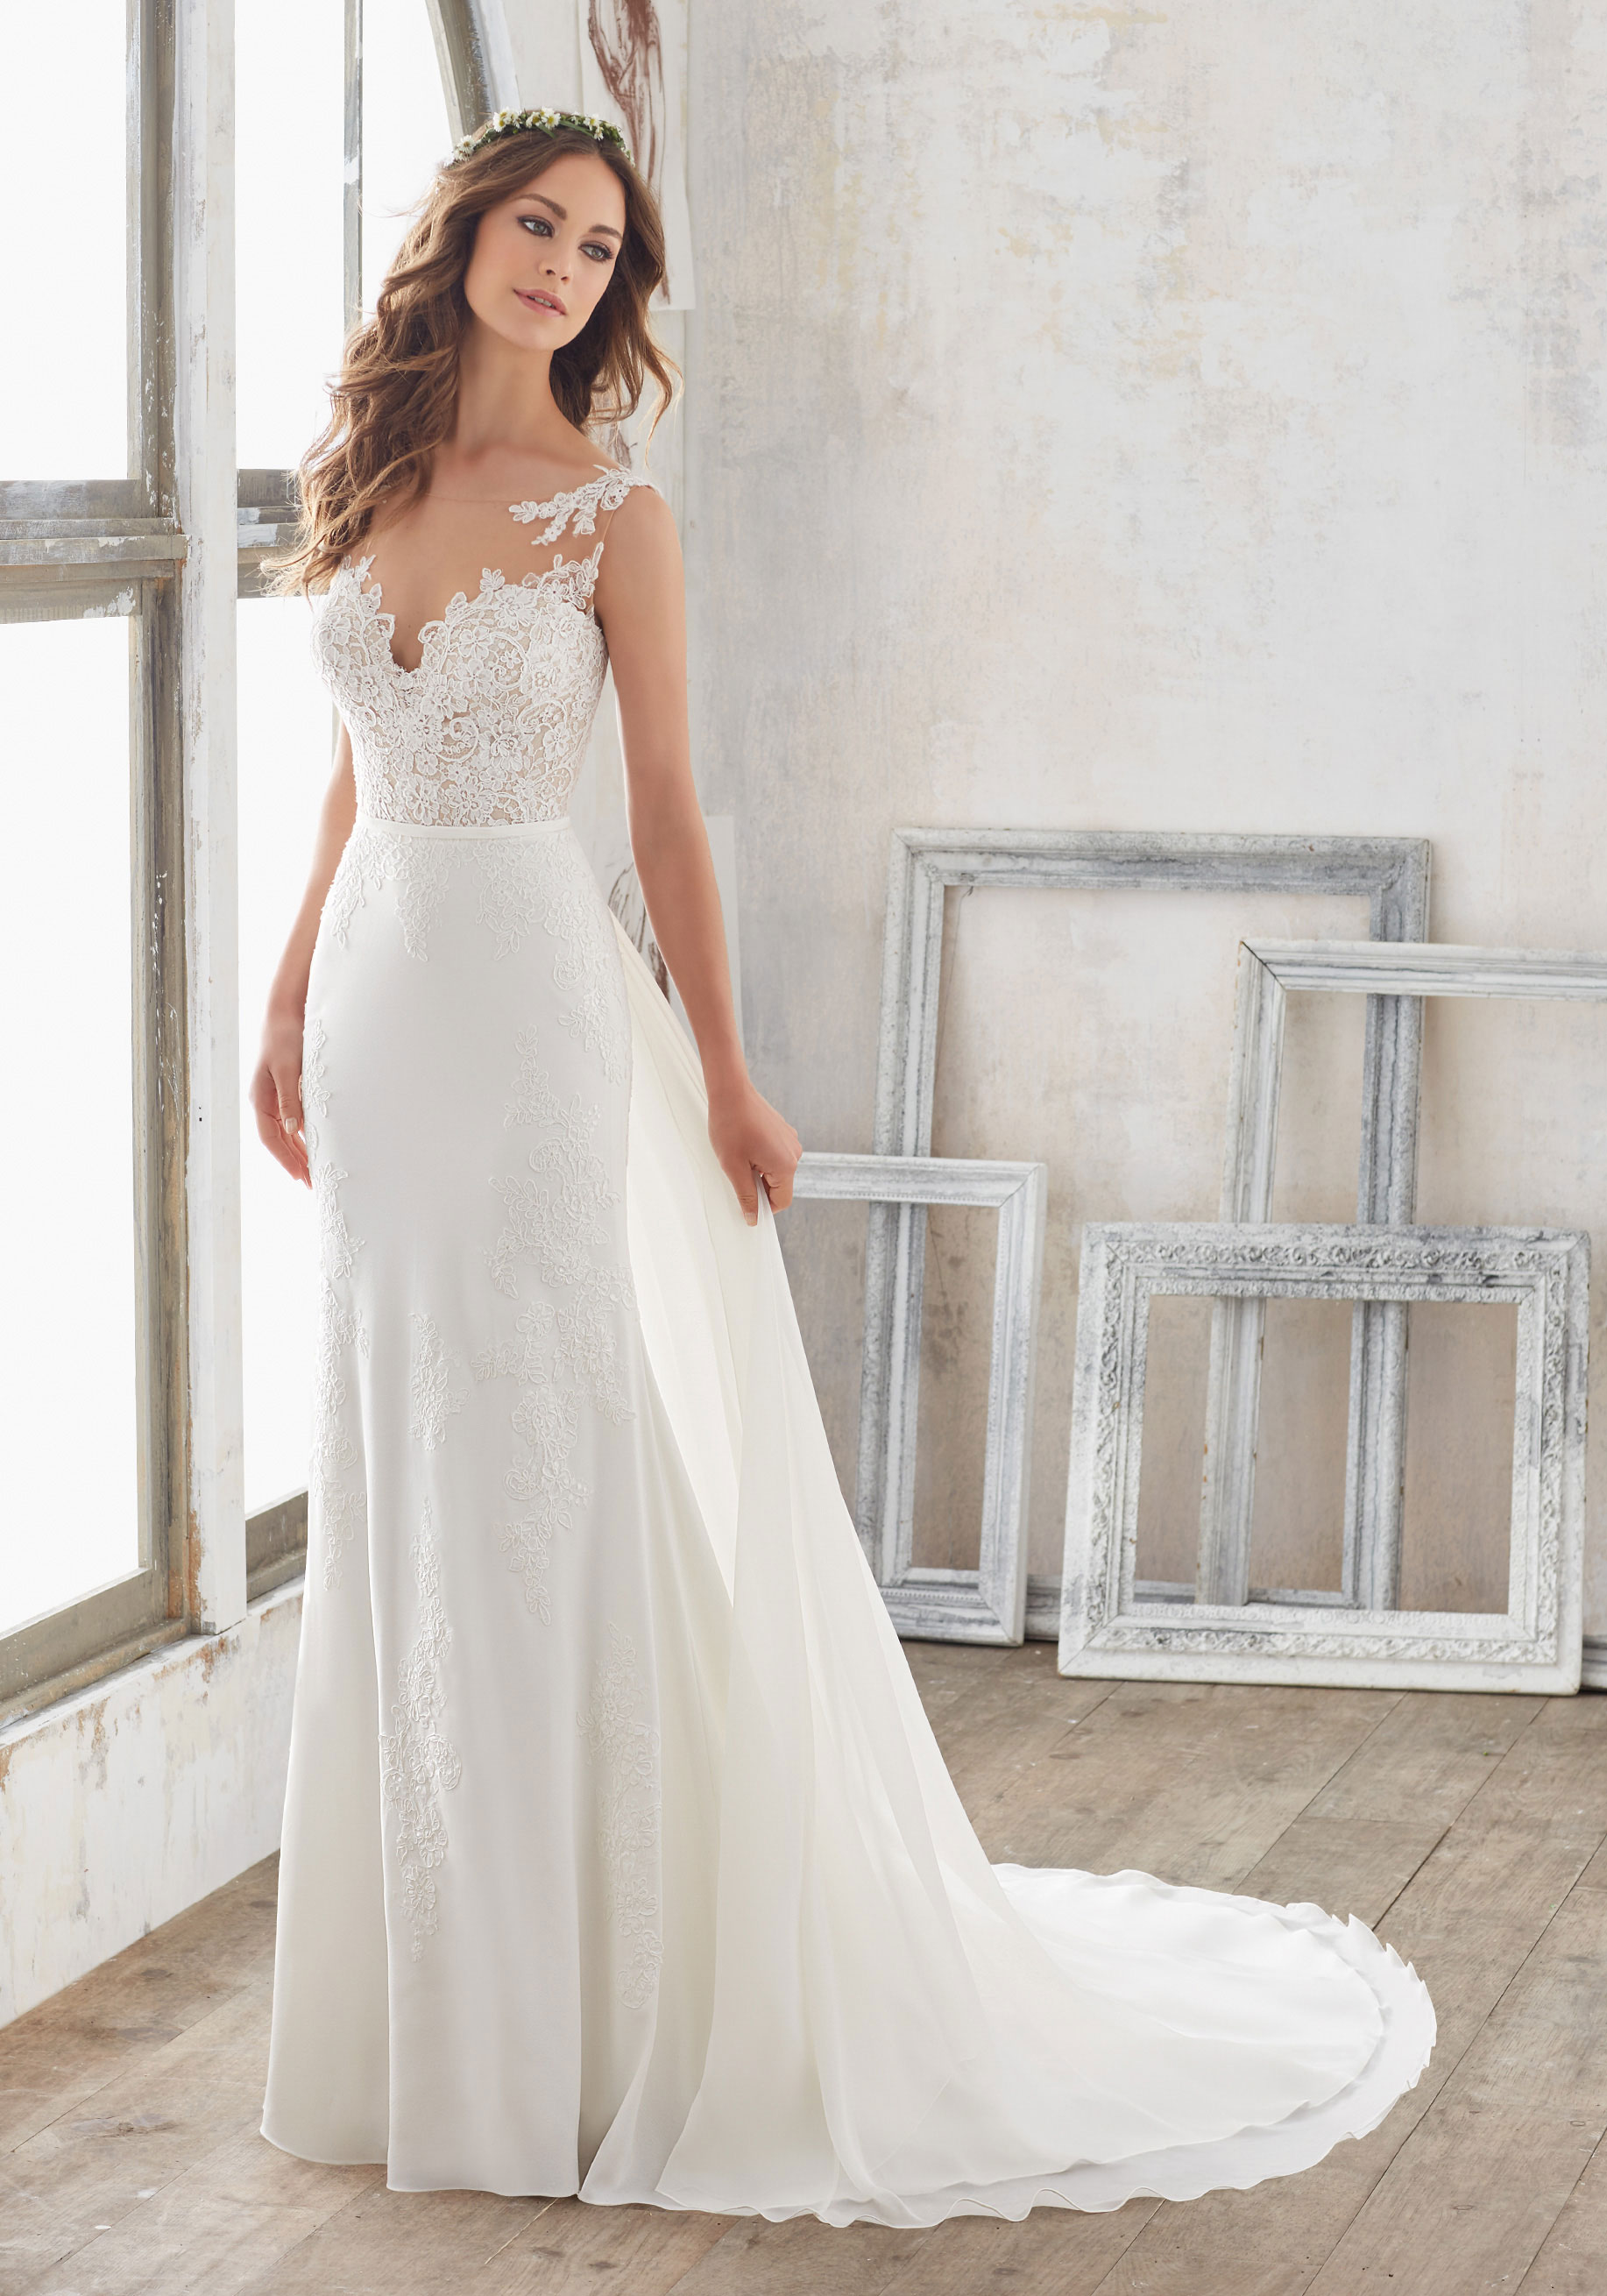 long sleeve wedding dresses under 1000 photo - 1